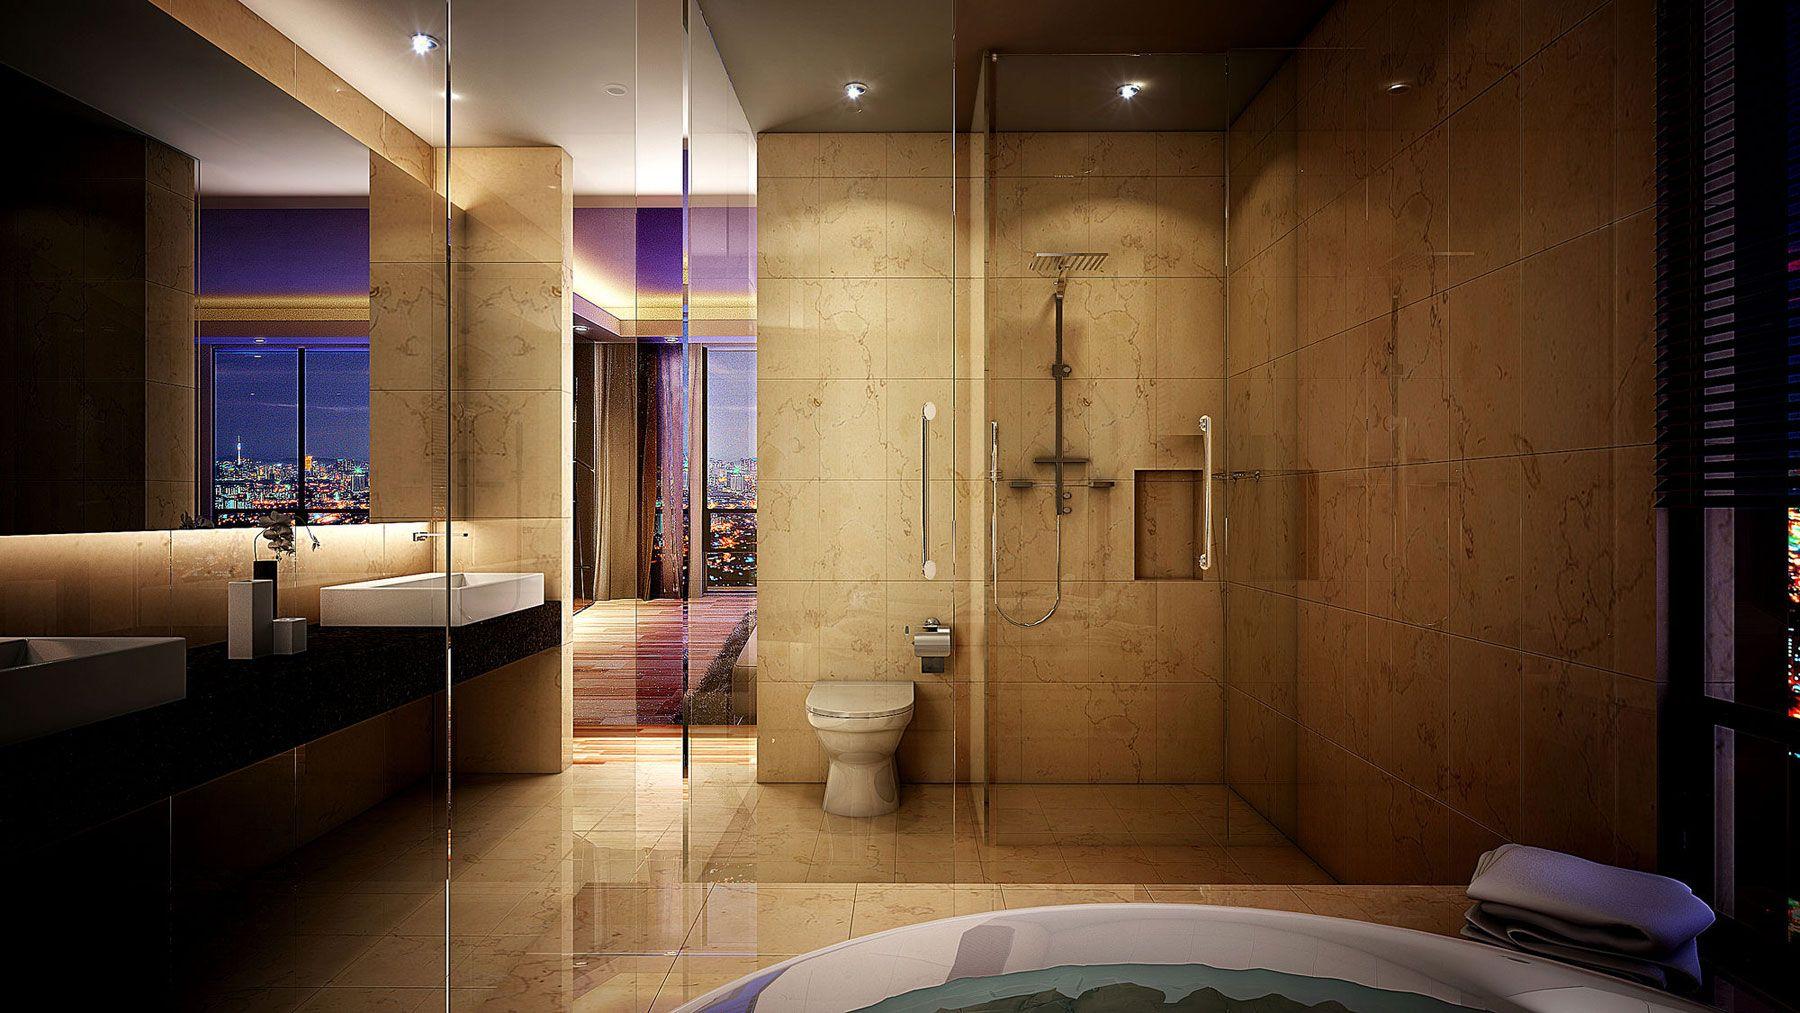 Pin by Laura Bertrand on Amaza Design | Pinterest | Bathroom, Master ...